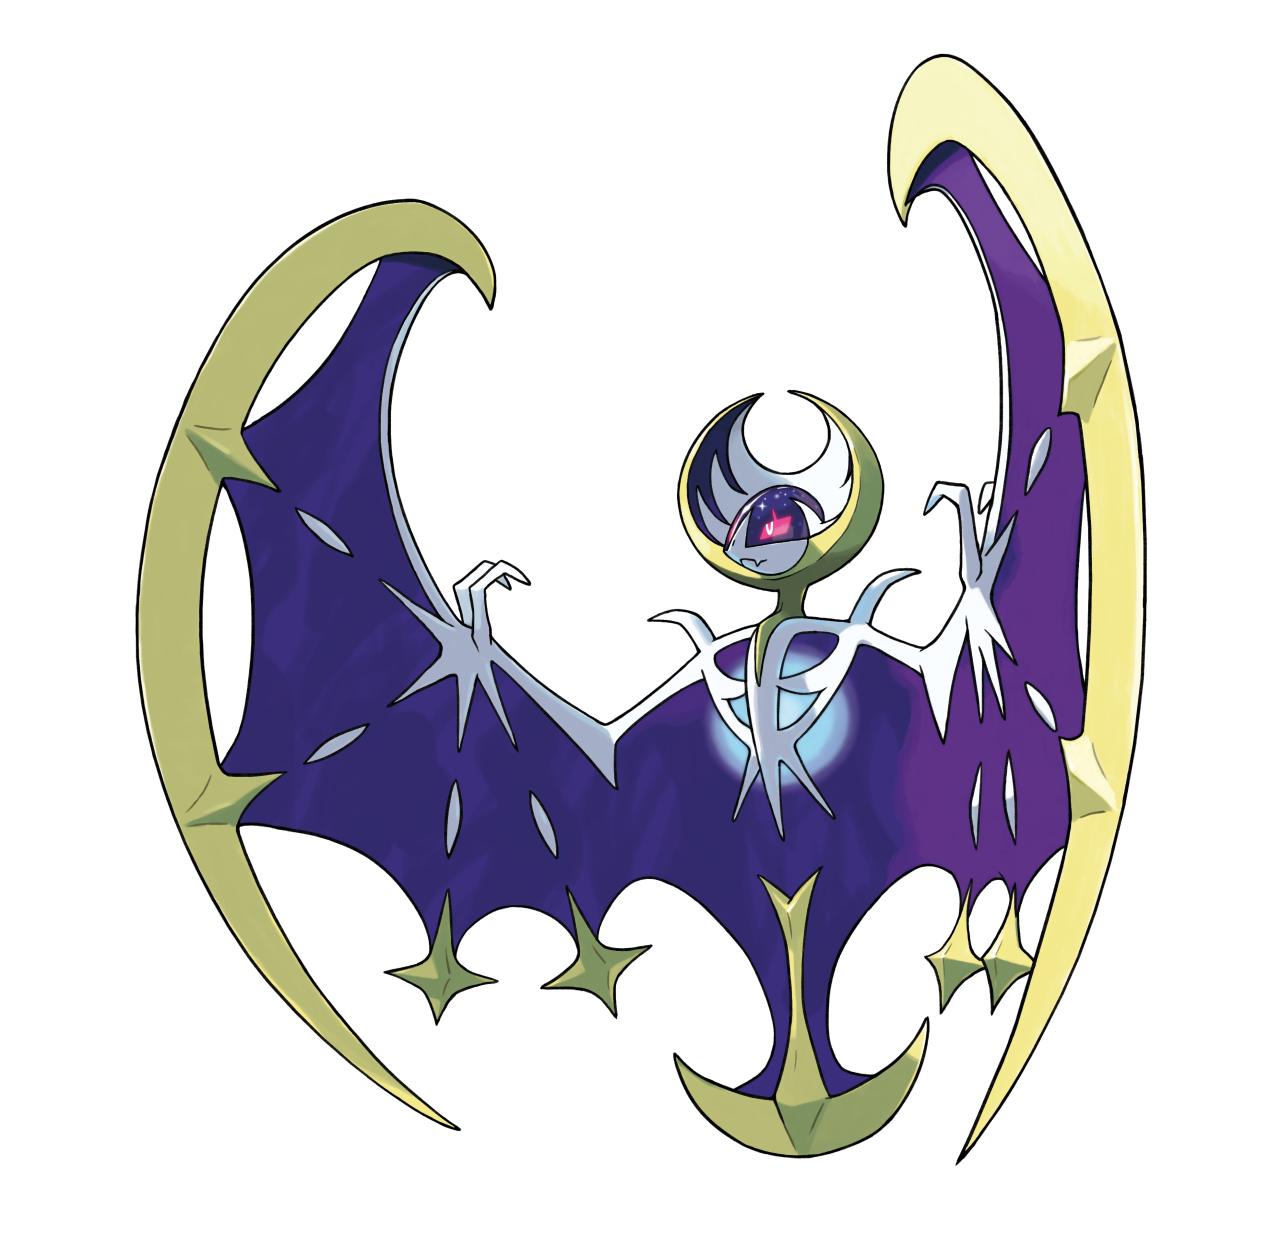 Pokemon Sun and Moon Pokedex roundup: names, descriptions